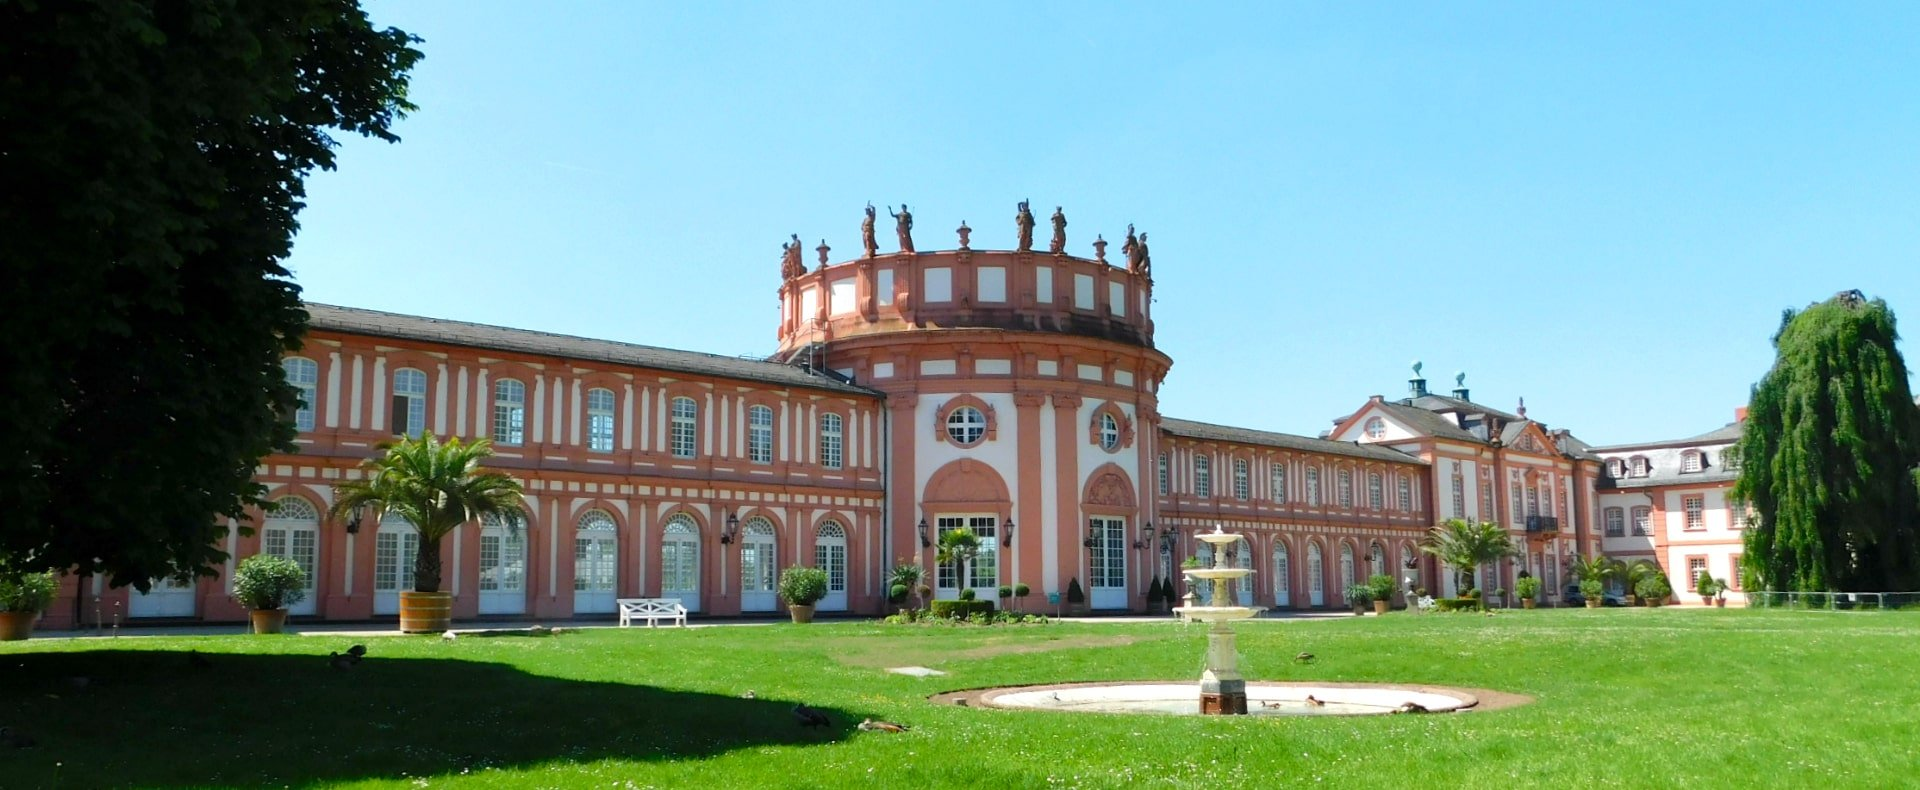 Wiesbaden, Biebrich Schloss, Germany